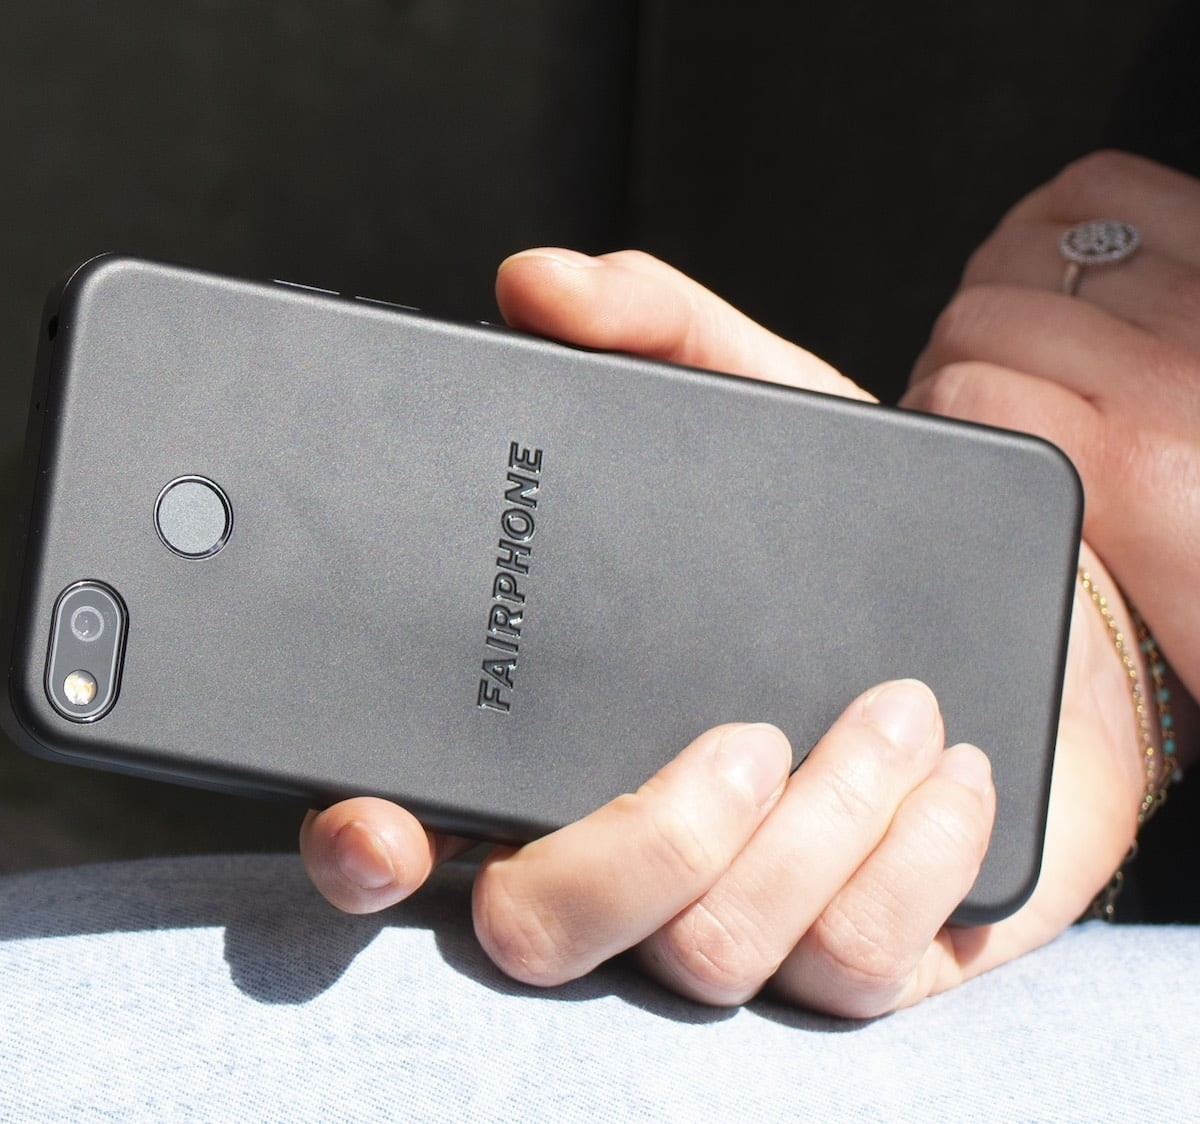 Fairphone 3+ sustainable phone uses 37% recycled plastics